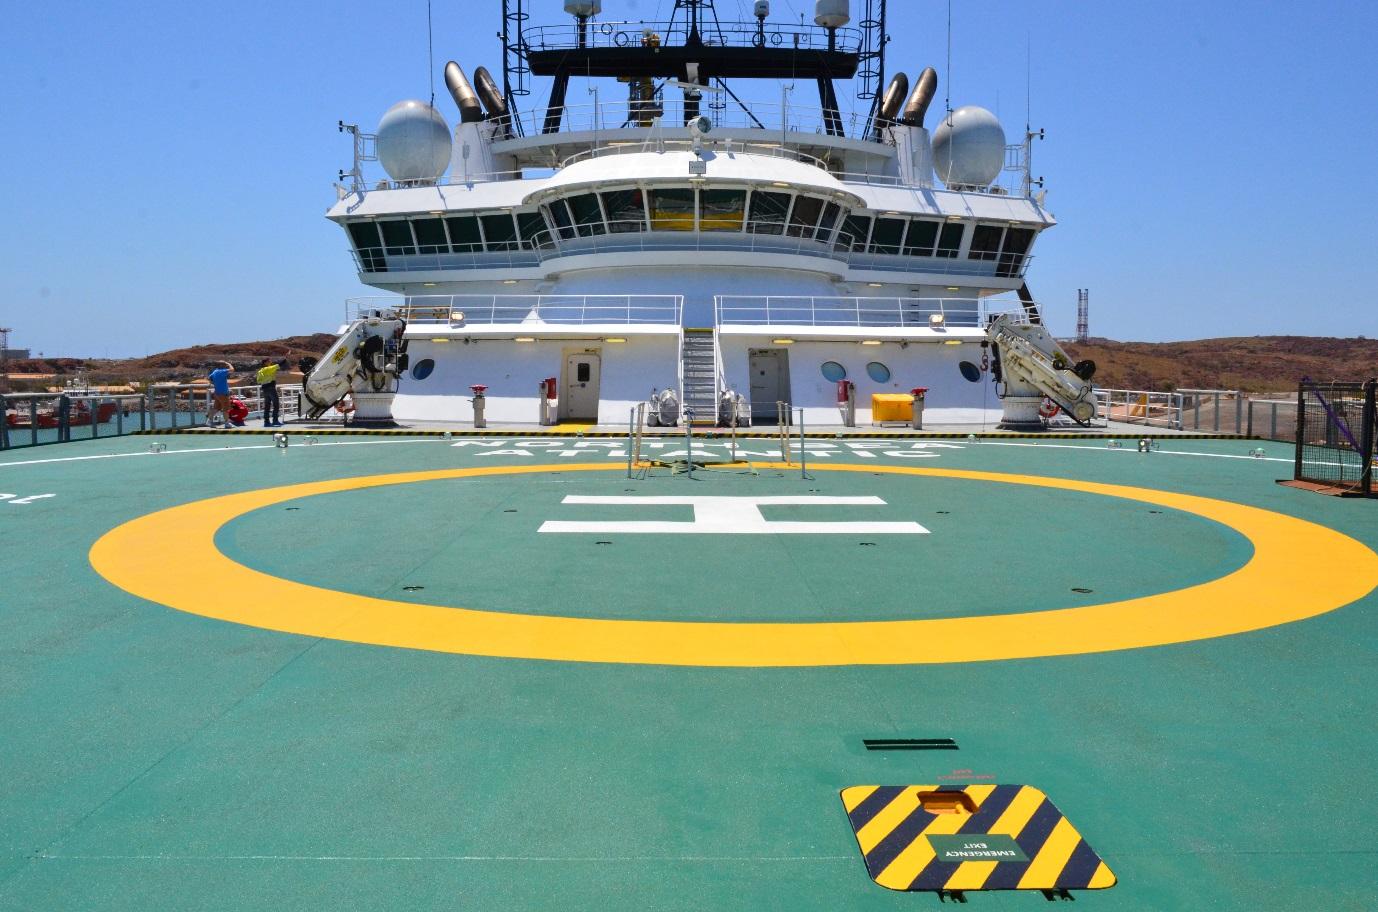 North Sea Atlantic Heli Deck Image